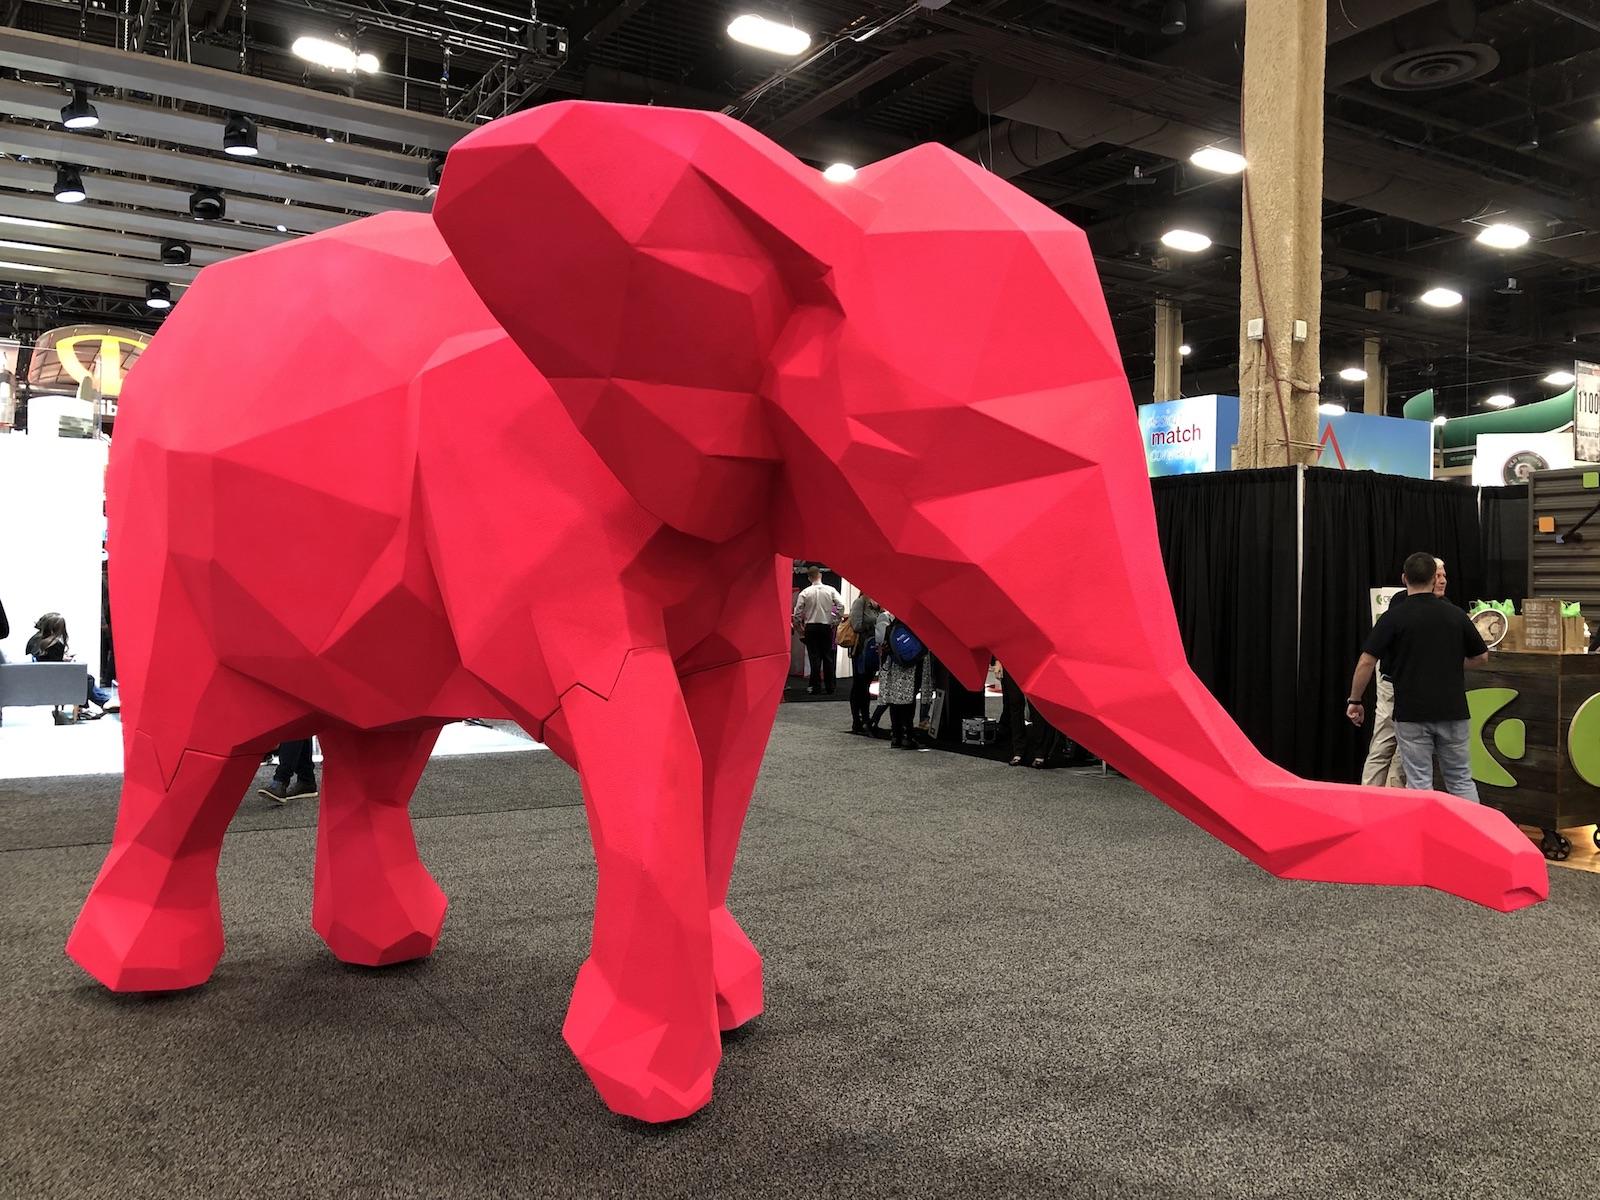 giant pink elephant at ExhibitorLive 2019